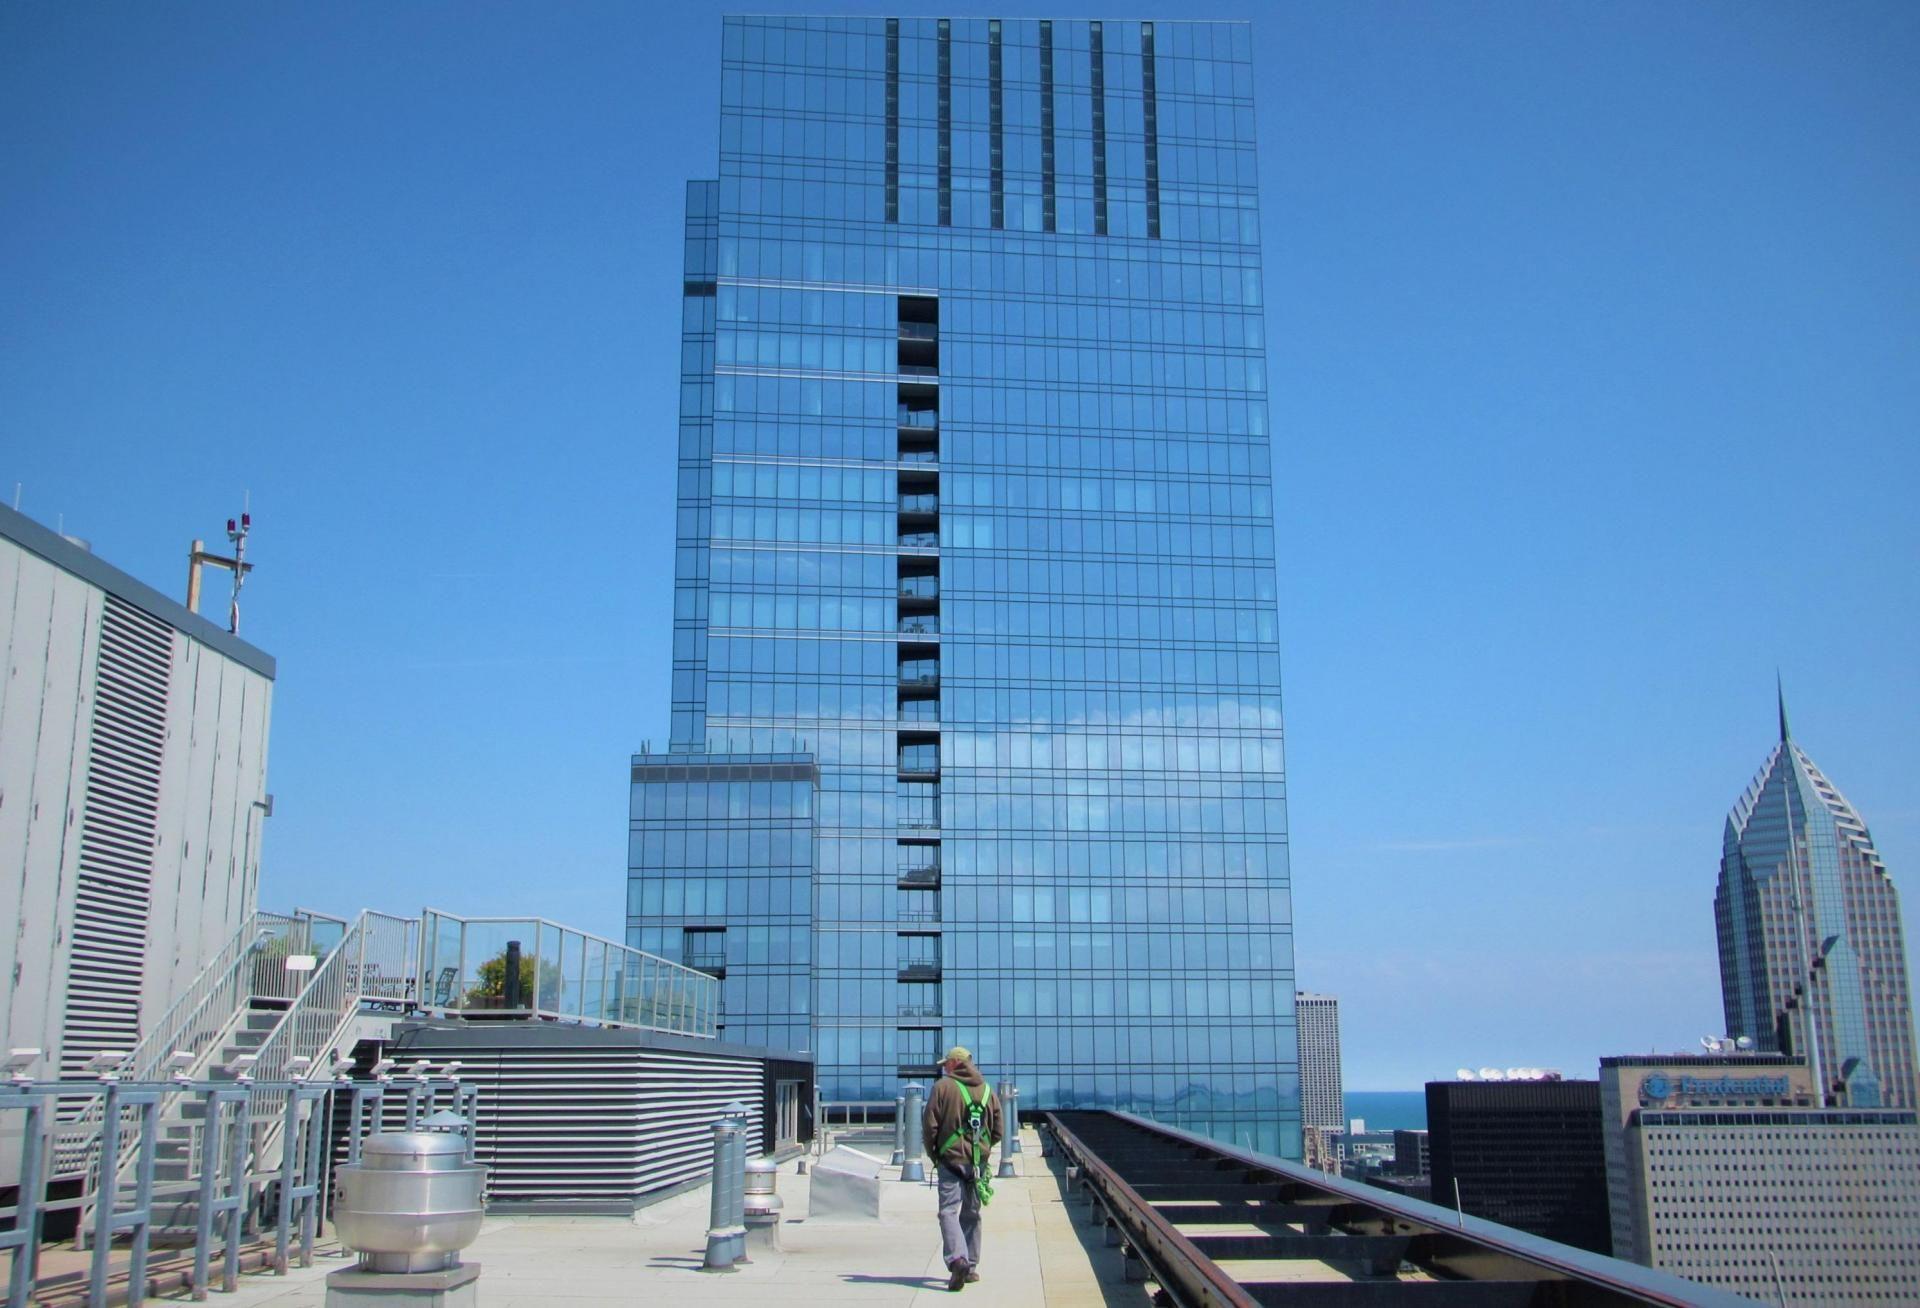 Windy City Rooftops: New Chicago Building Code Overhauls What's Overhead